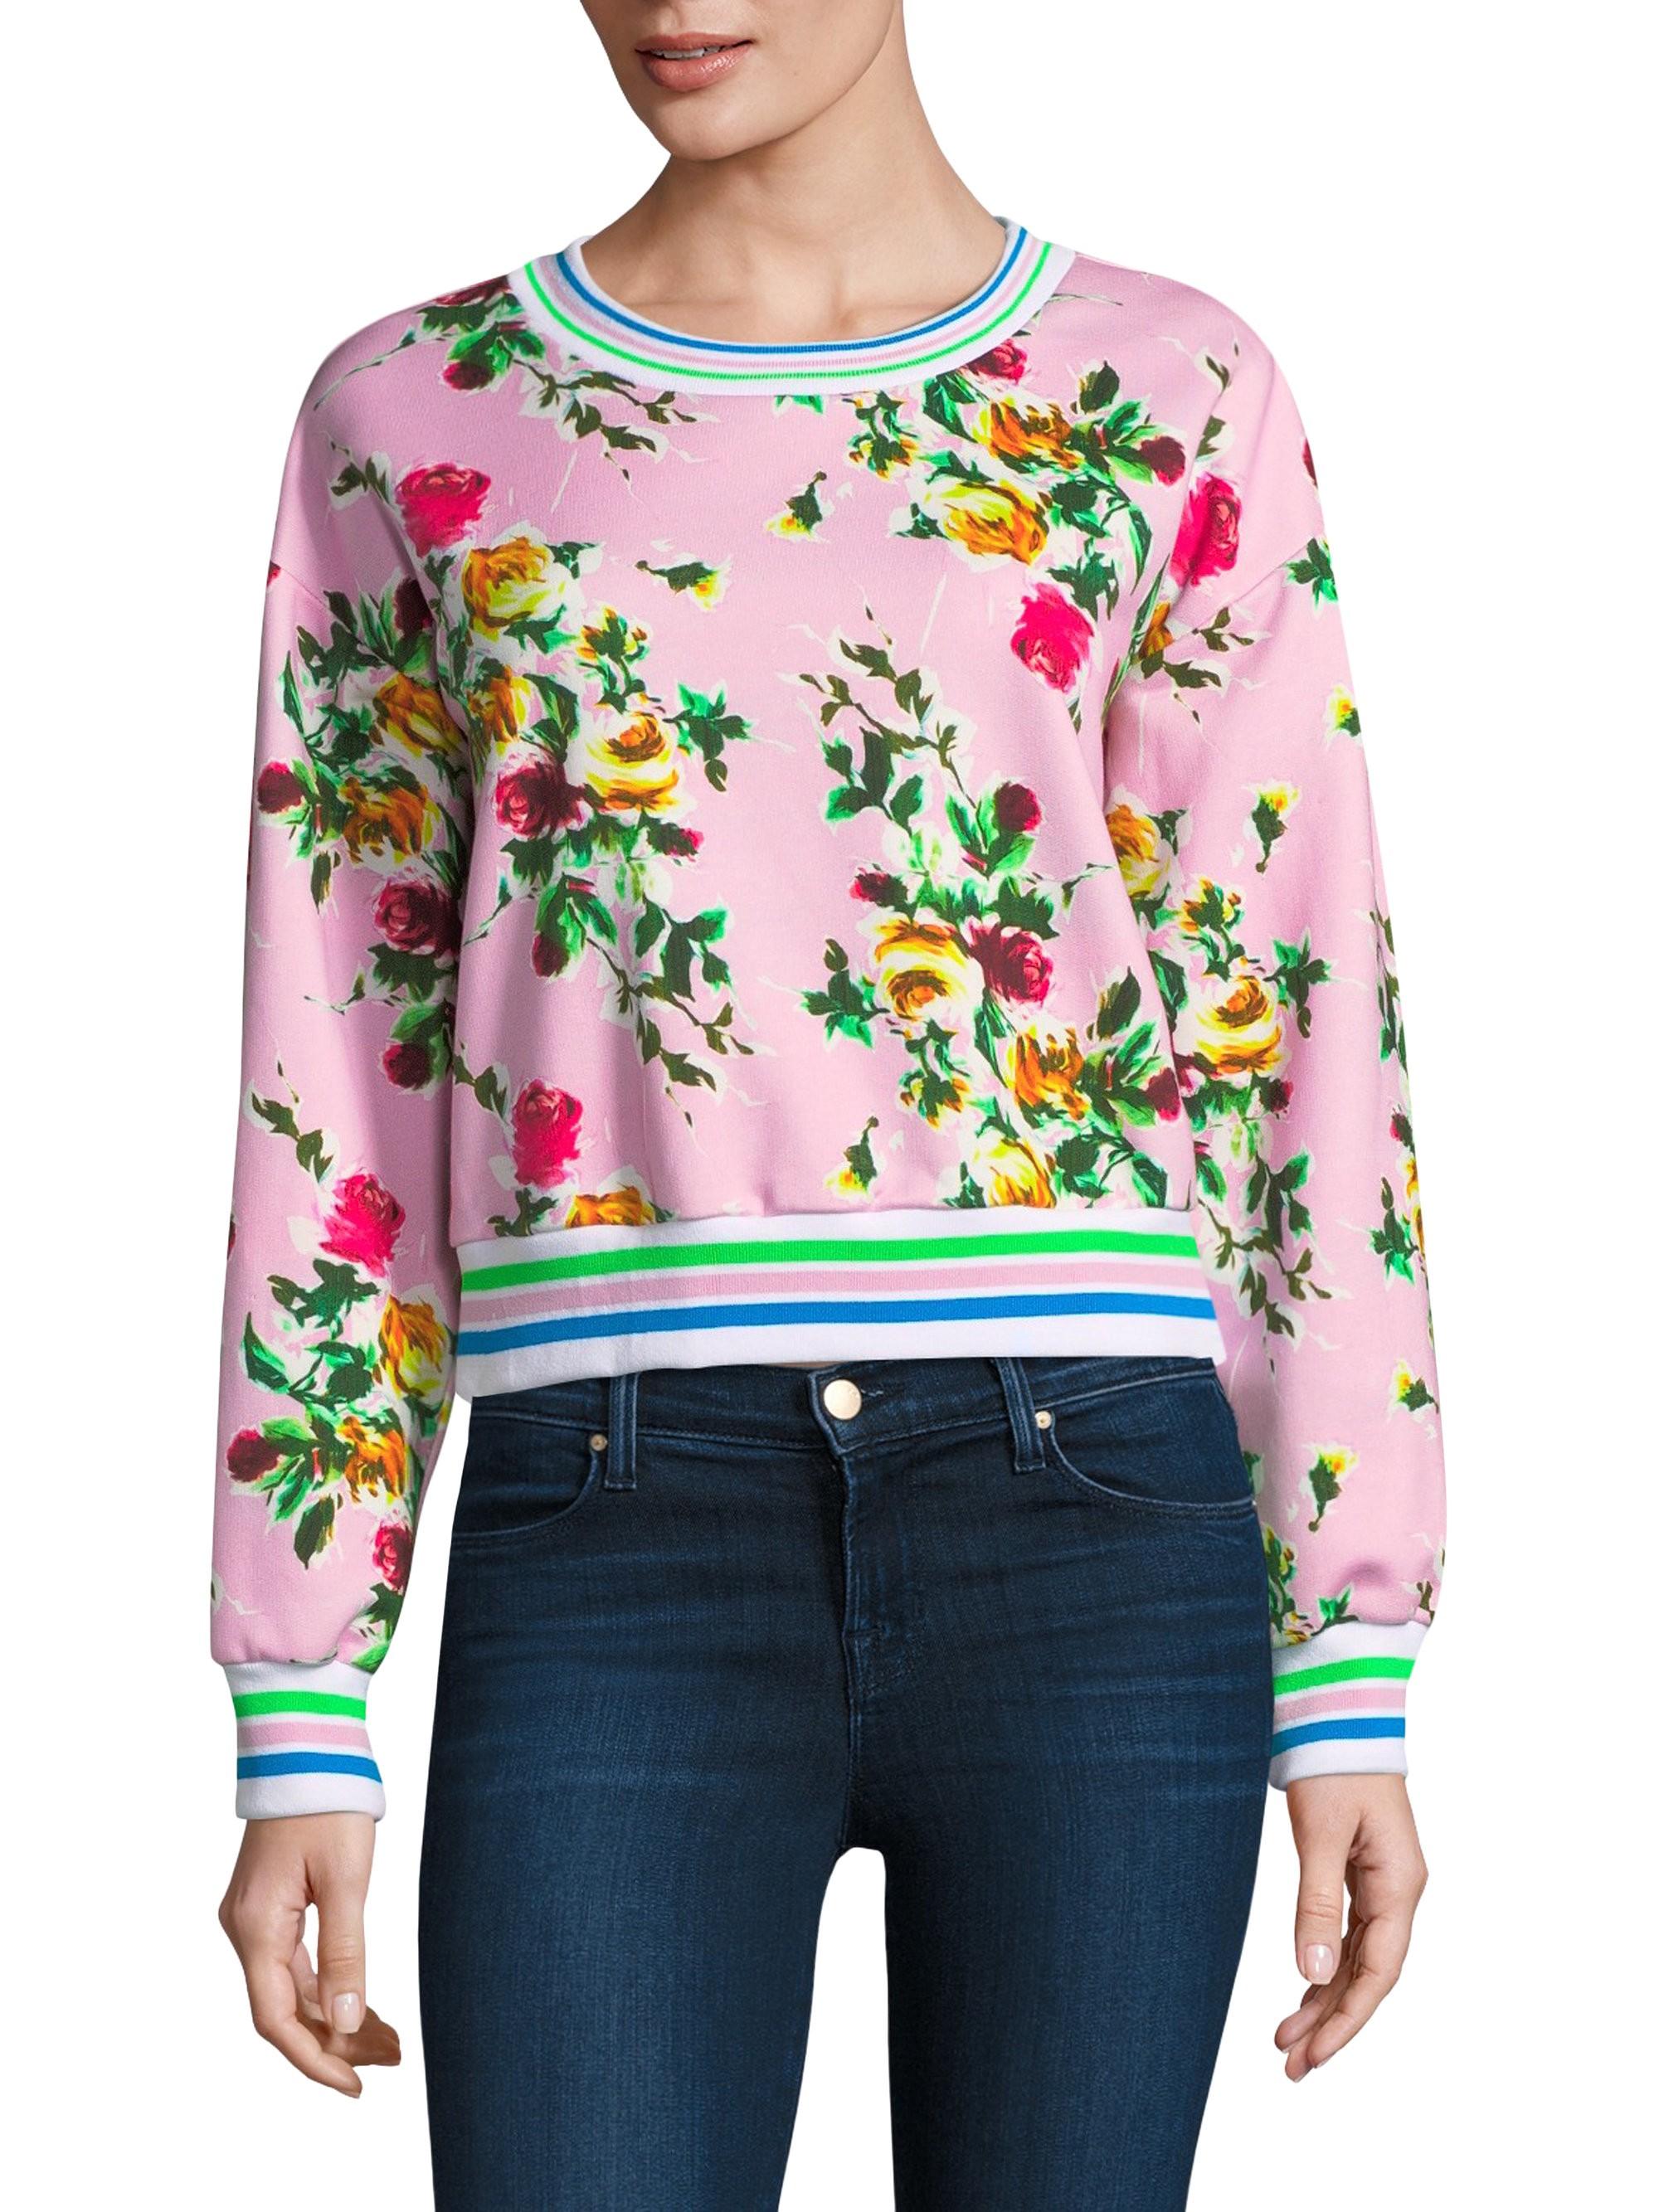 a14495308eea Milly Tyler Floral Sweatshirt - Petal X-Small